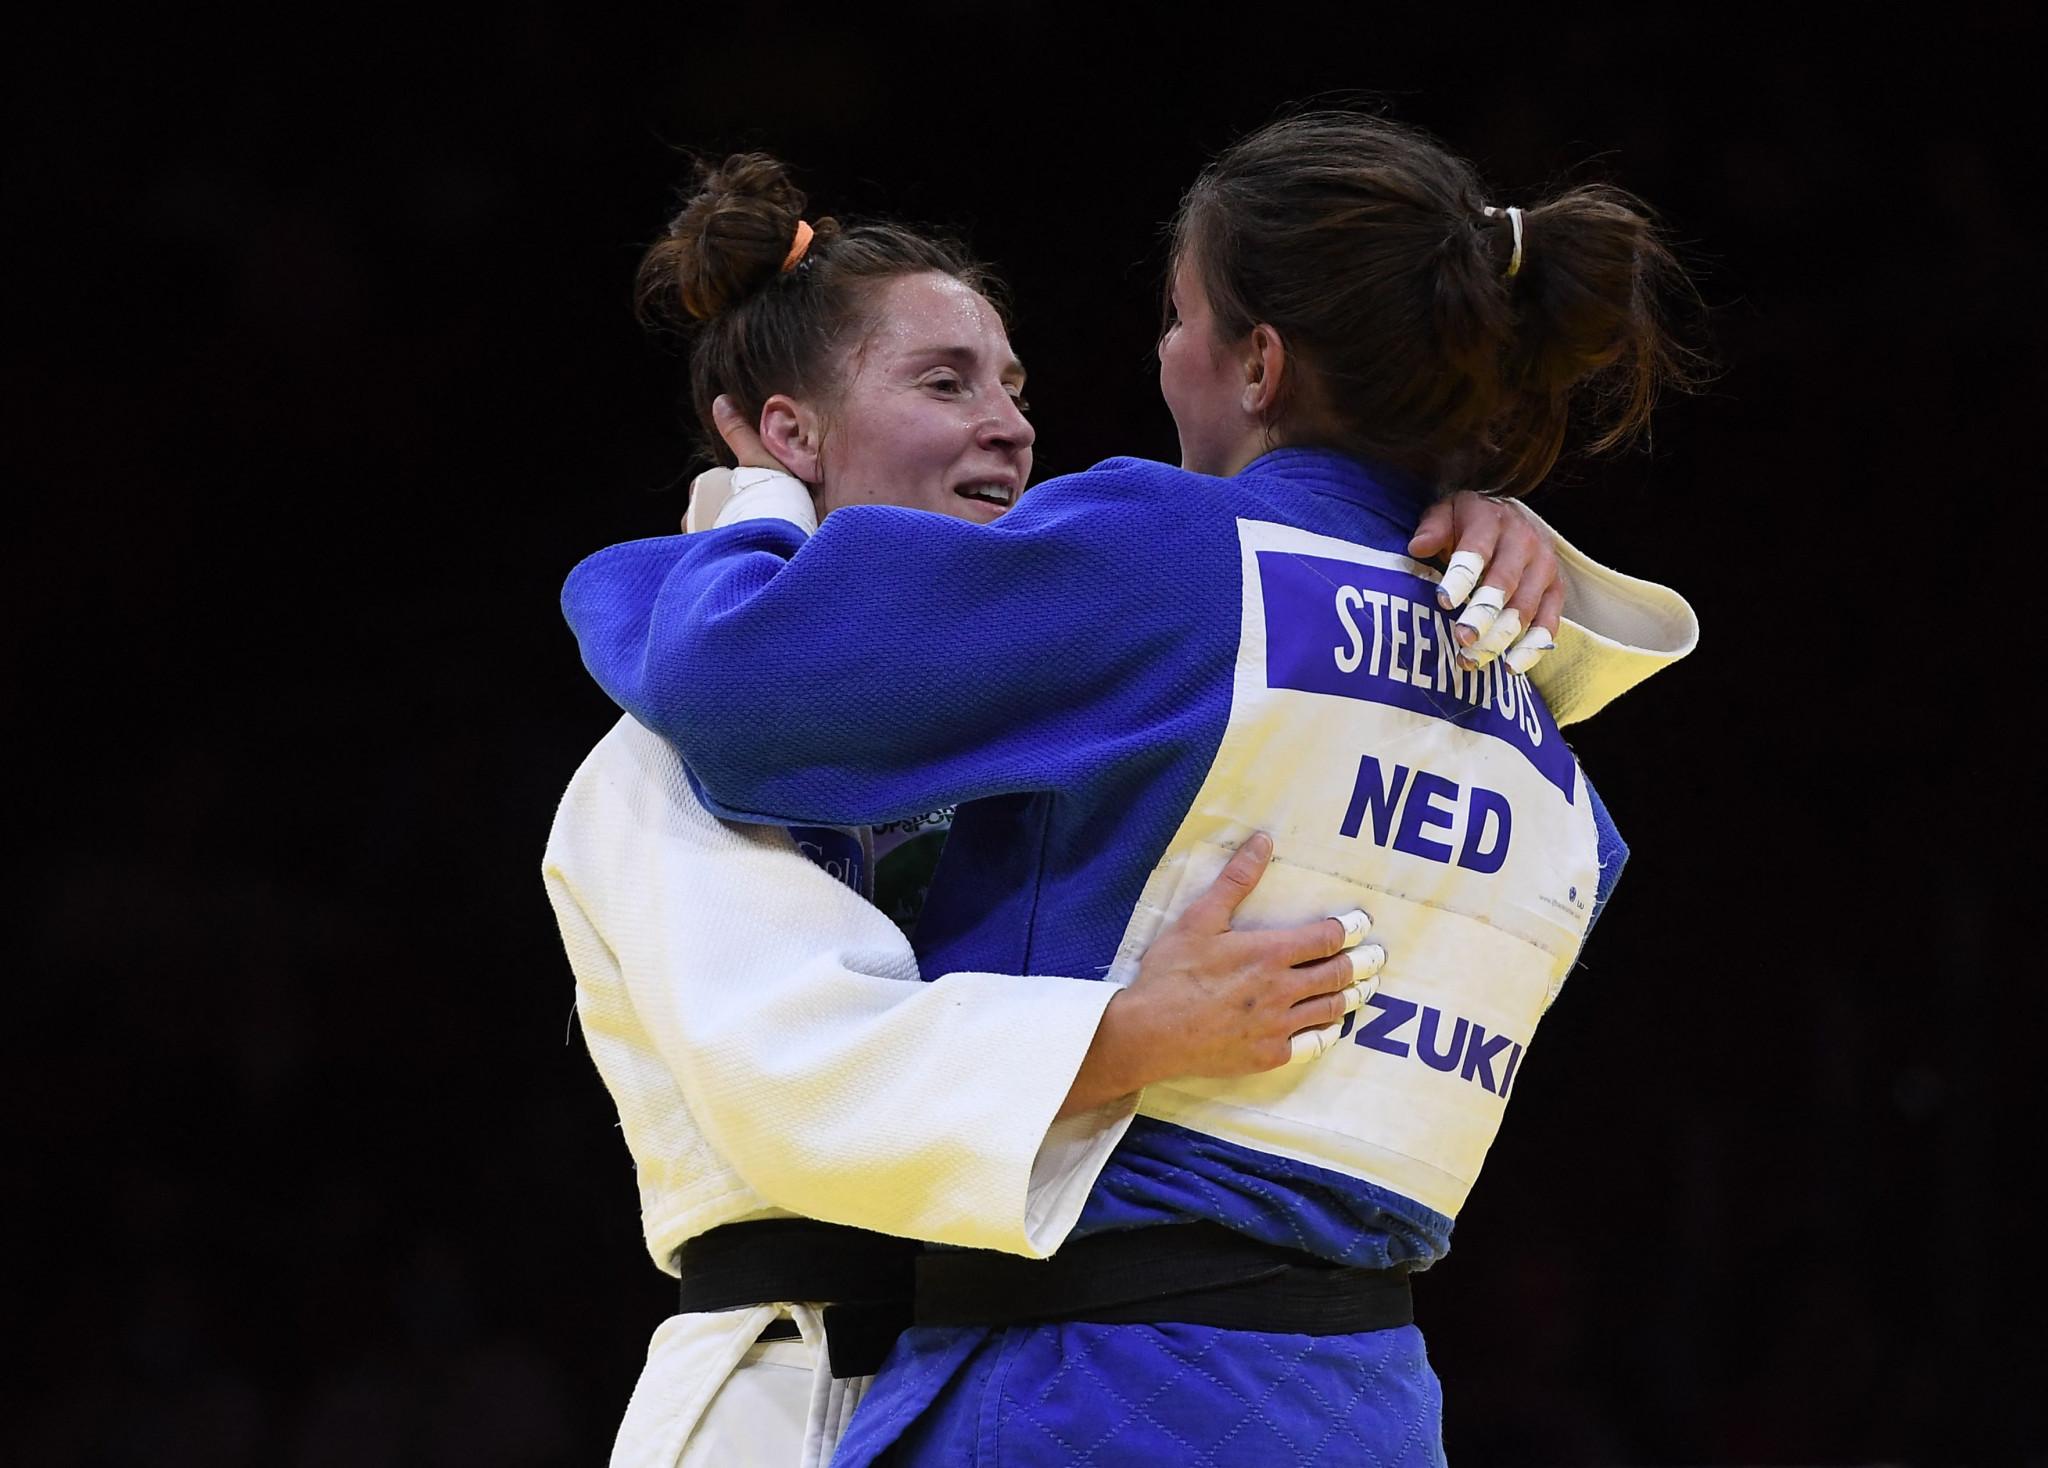 Dutch judokas Marhinde Verkerk and Guusje Steenhuis embrace as Verkerk competed in her final bout ©Getty Images